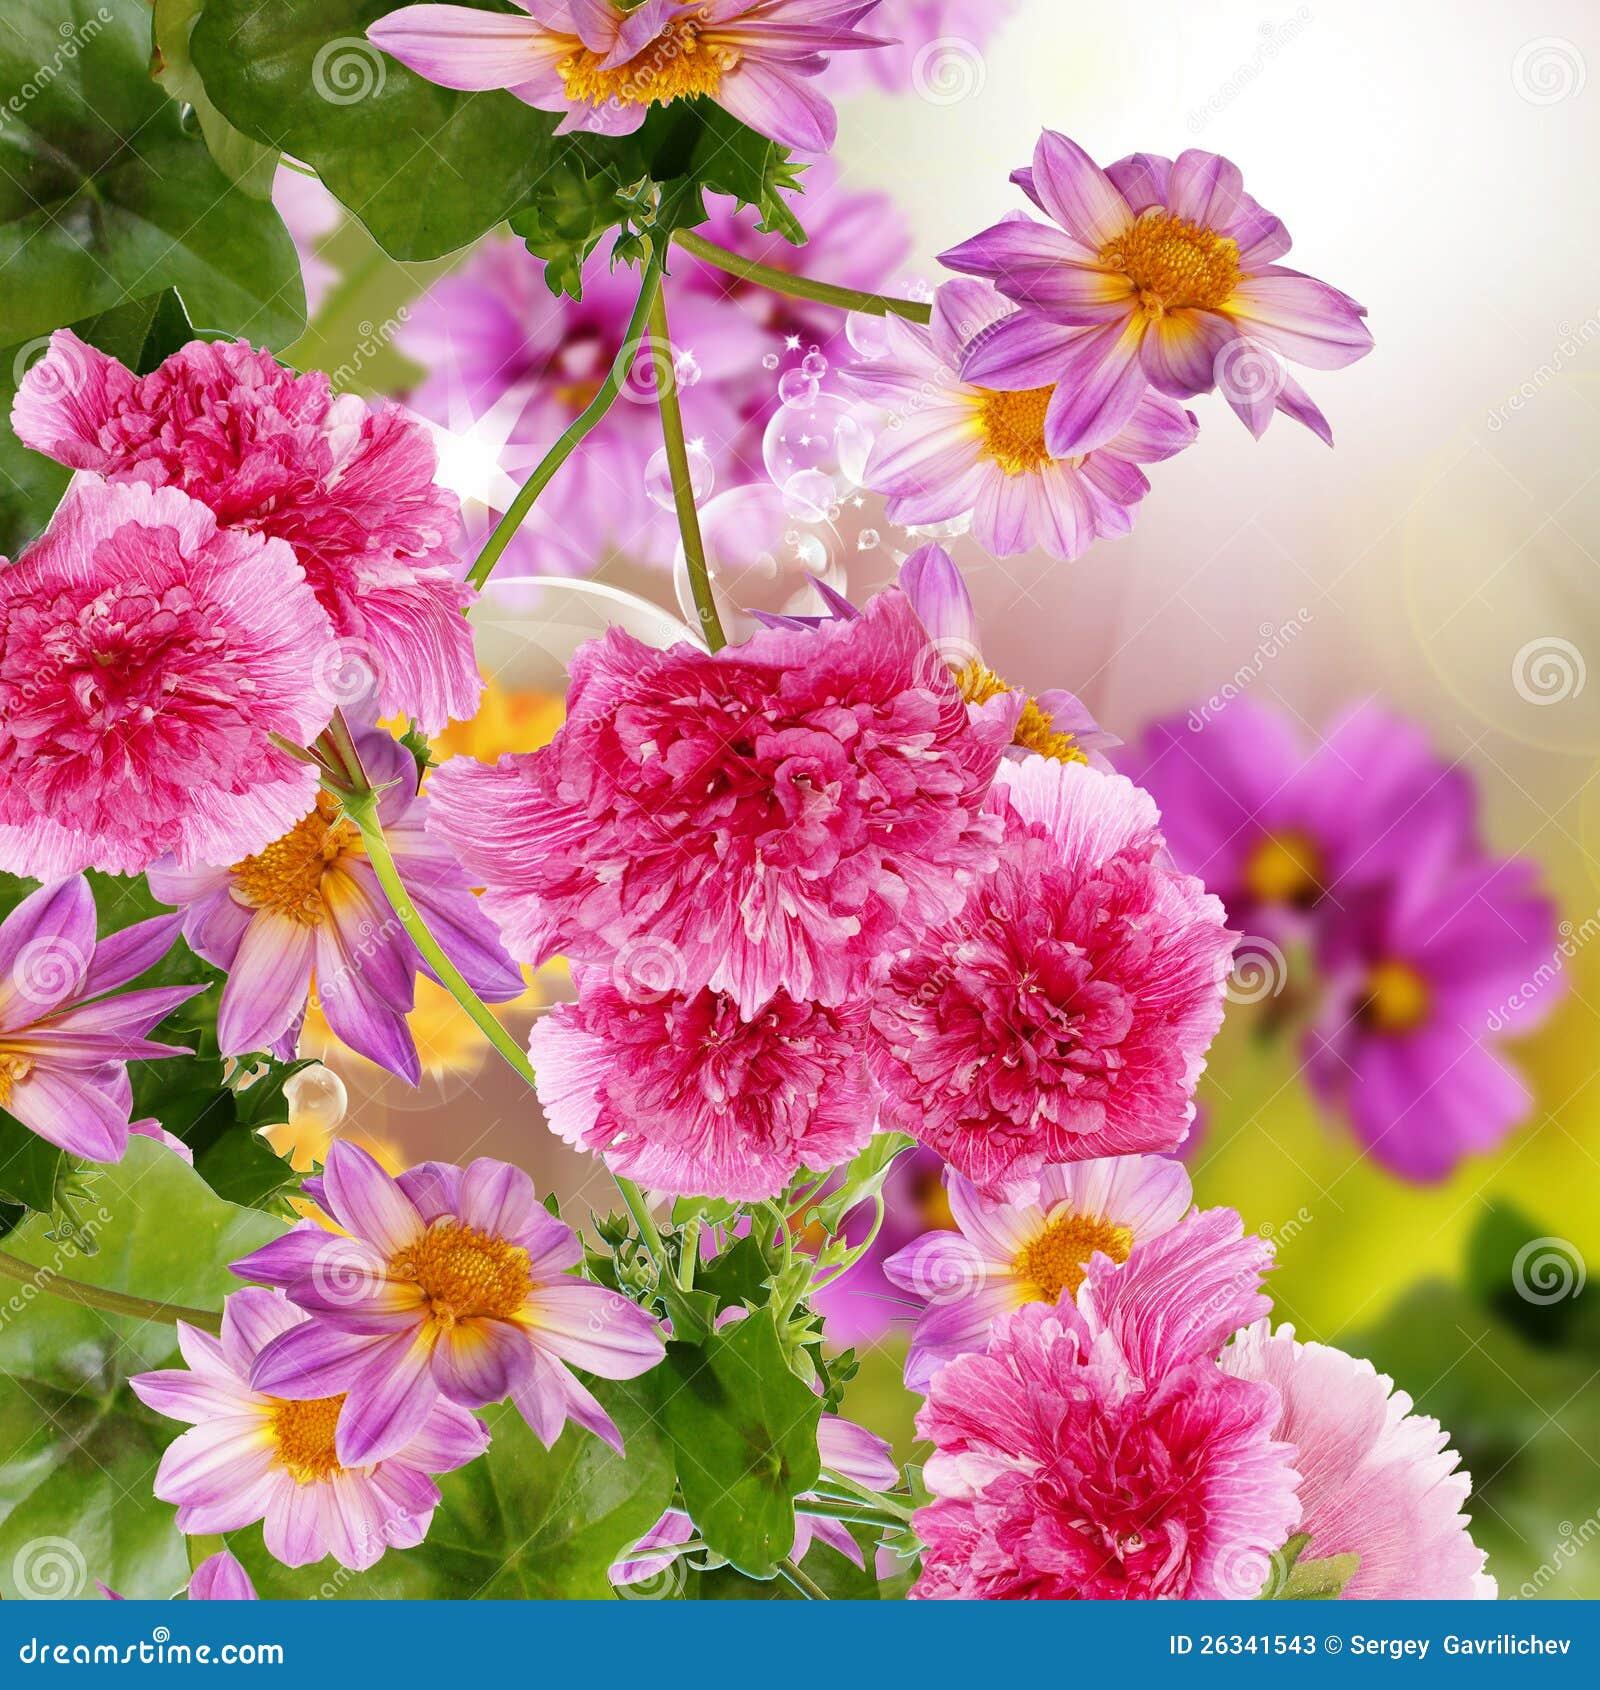 flowers garden. Flowers Garden